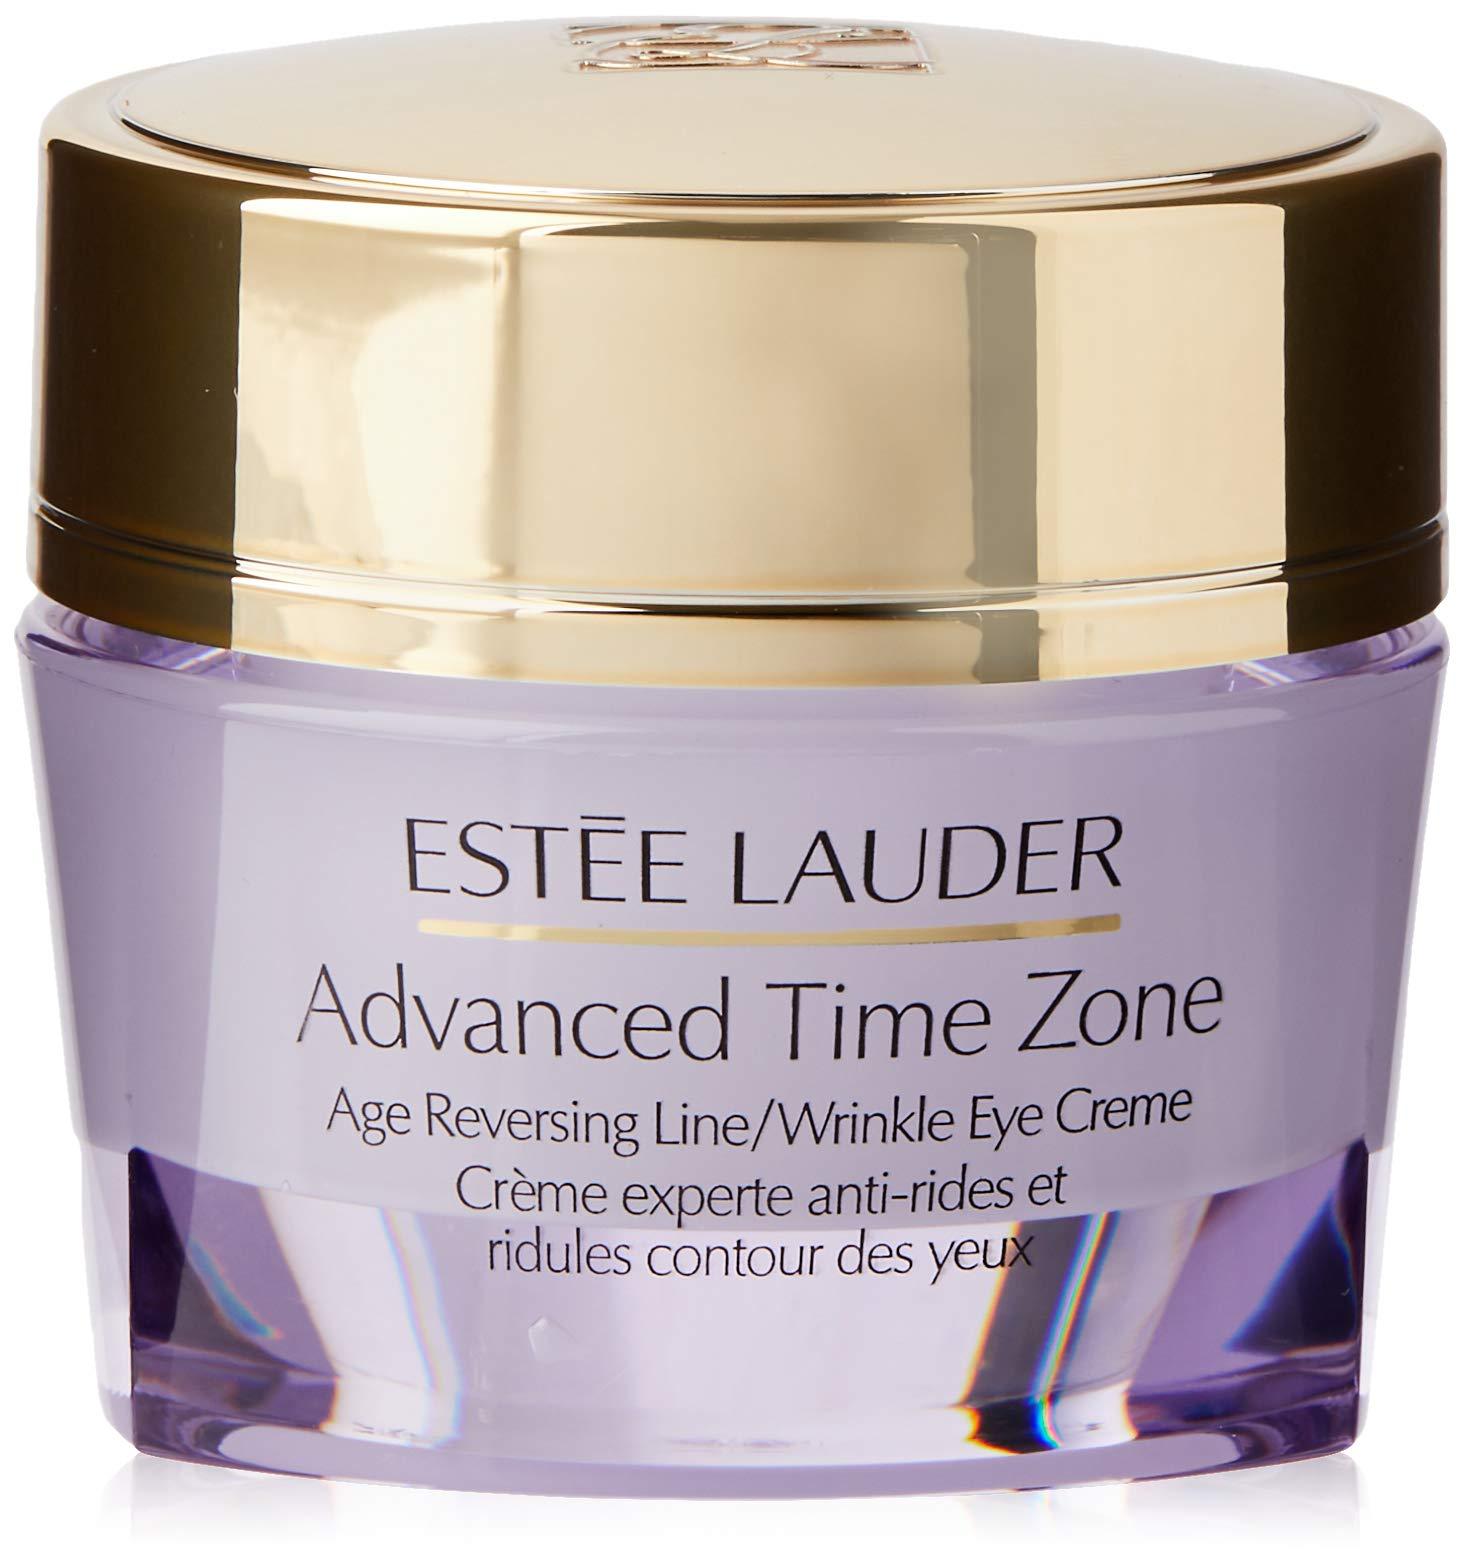 Estee Lauder Time Zone Anti-Line/wrinkle Eye Creme Creme For Unisex 0.5 oz